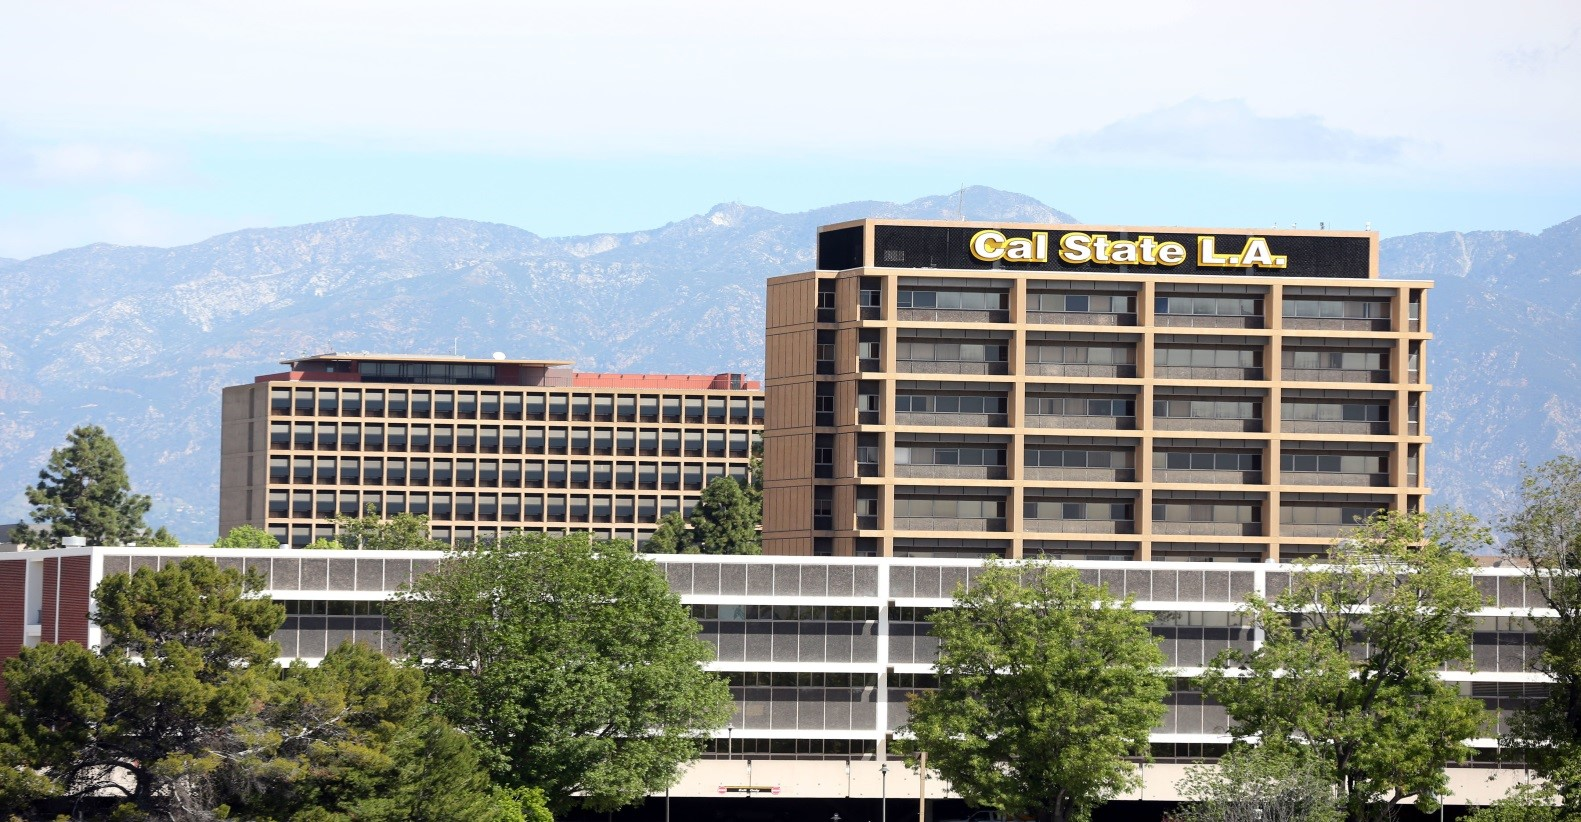 Cal State LA Campus View